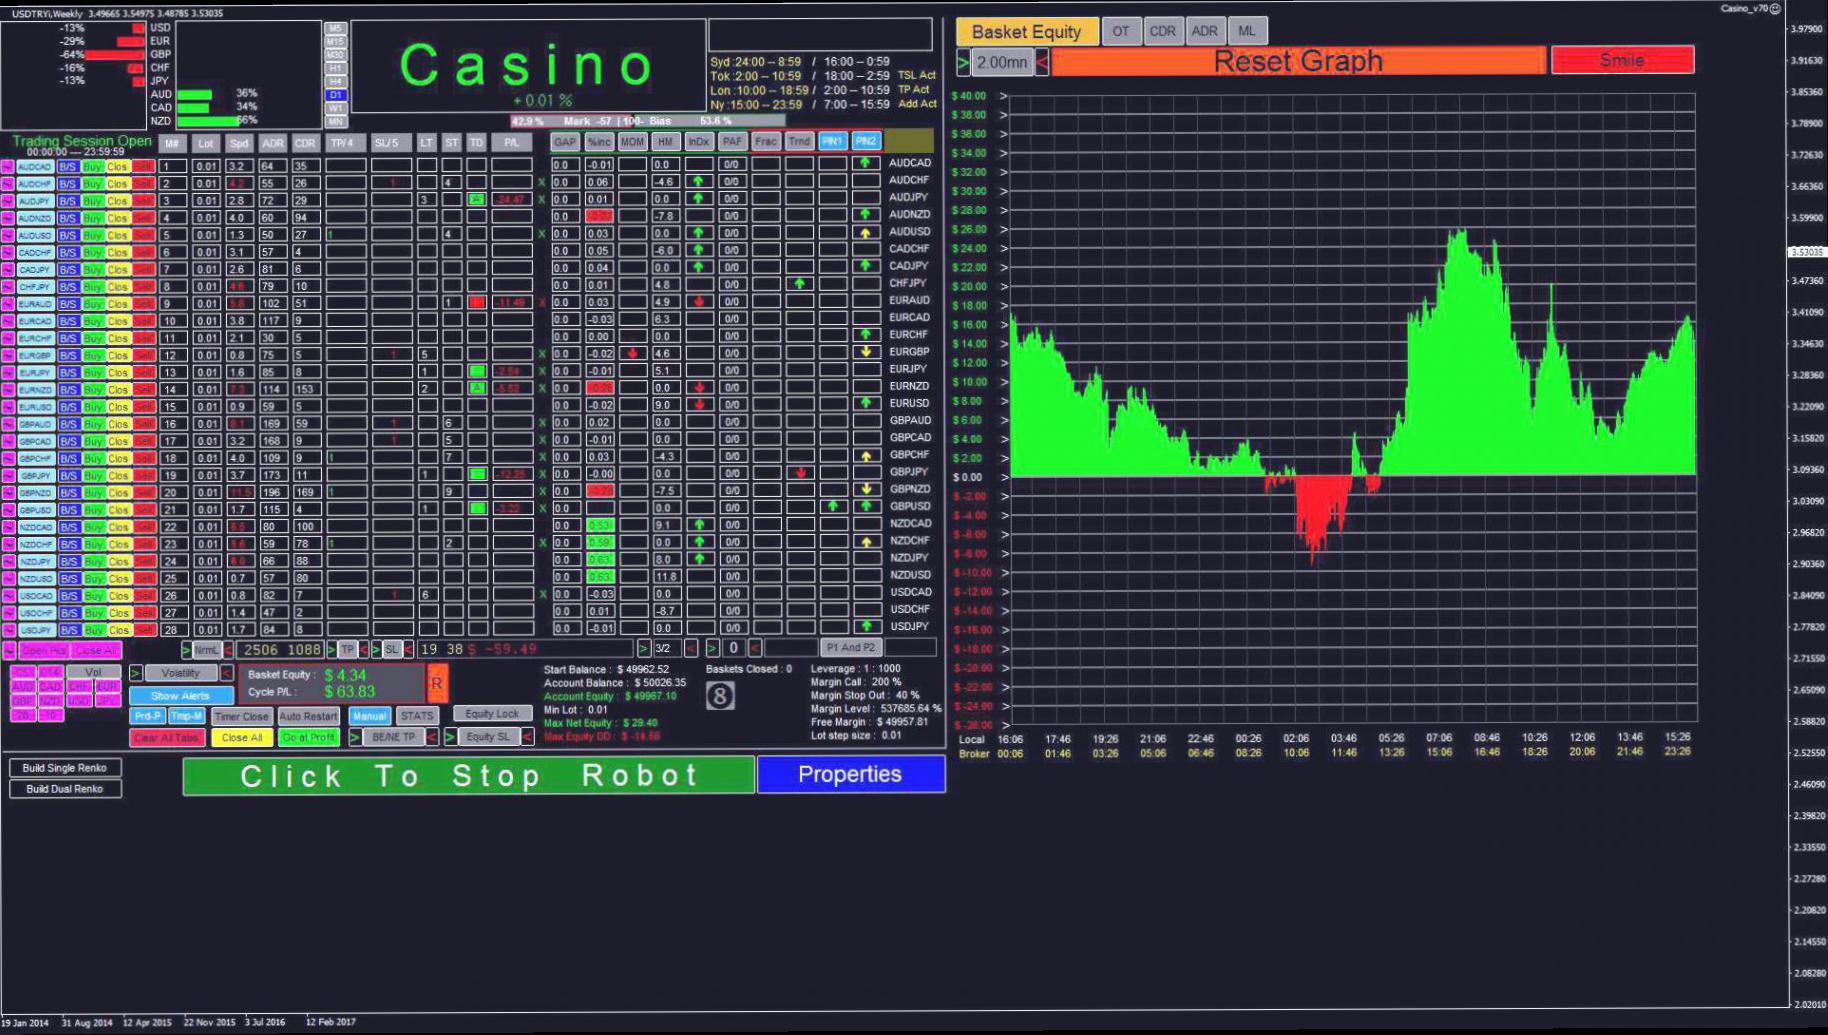 Ea casino forex rio casino bowling